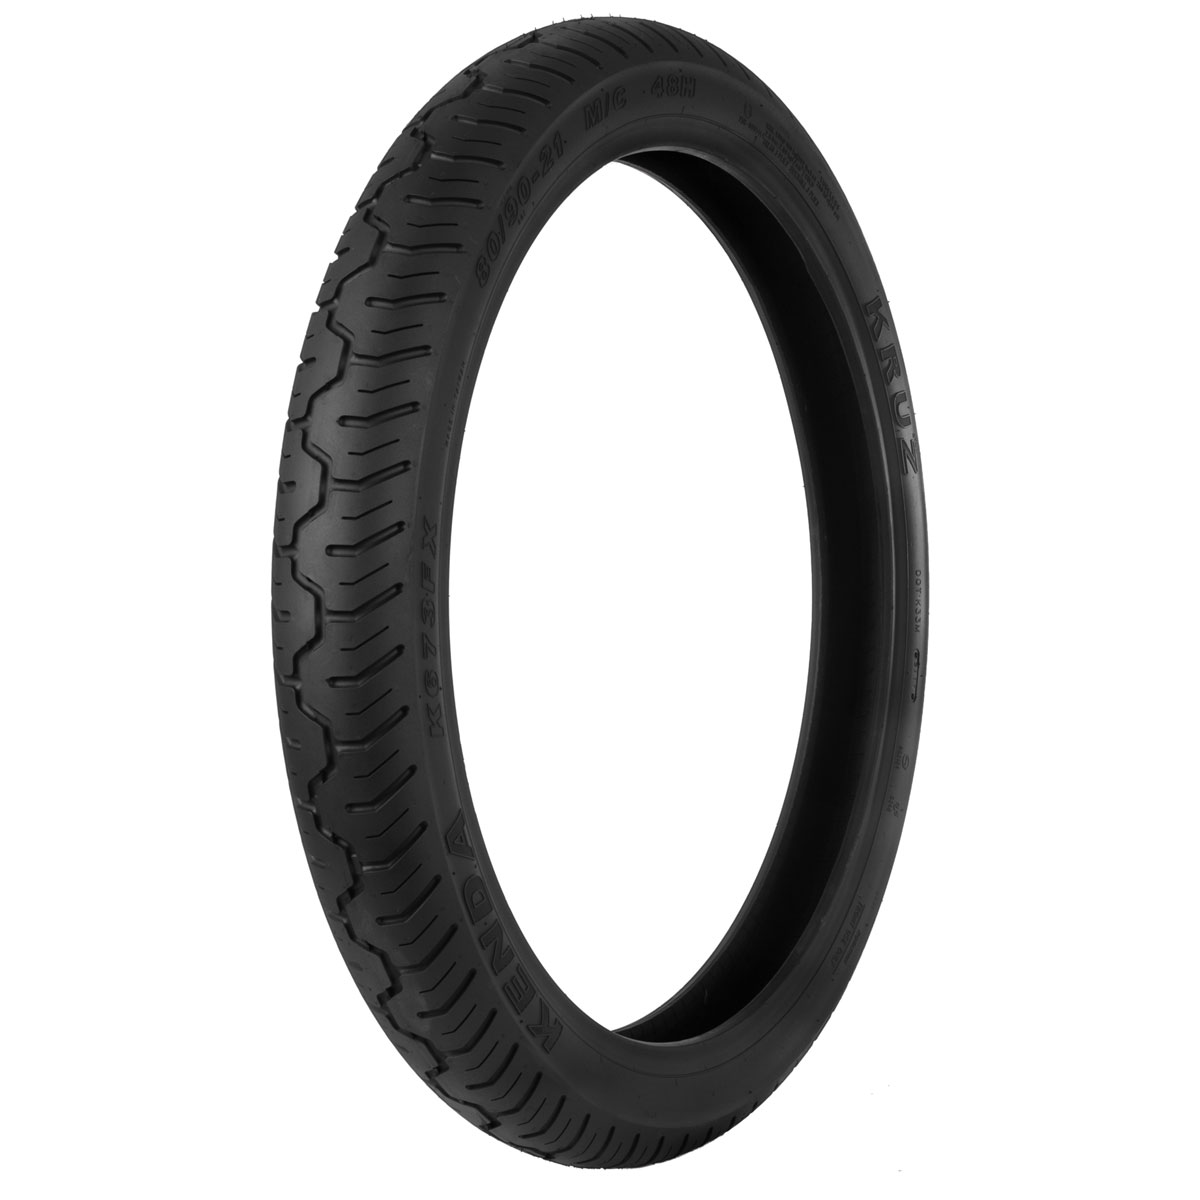 Kenda Tires K673 Kruz 130/70H-18 Front Tire